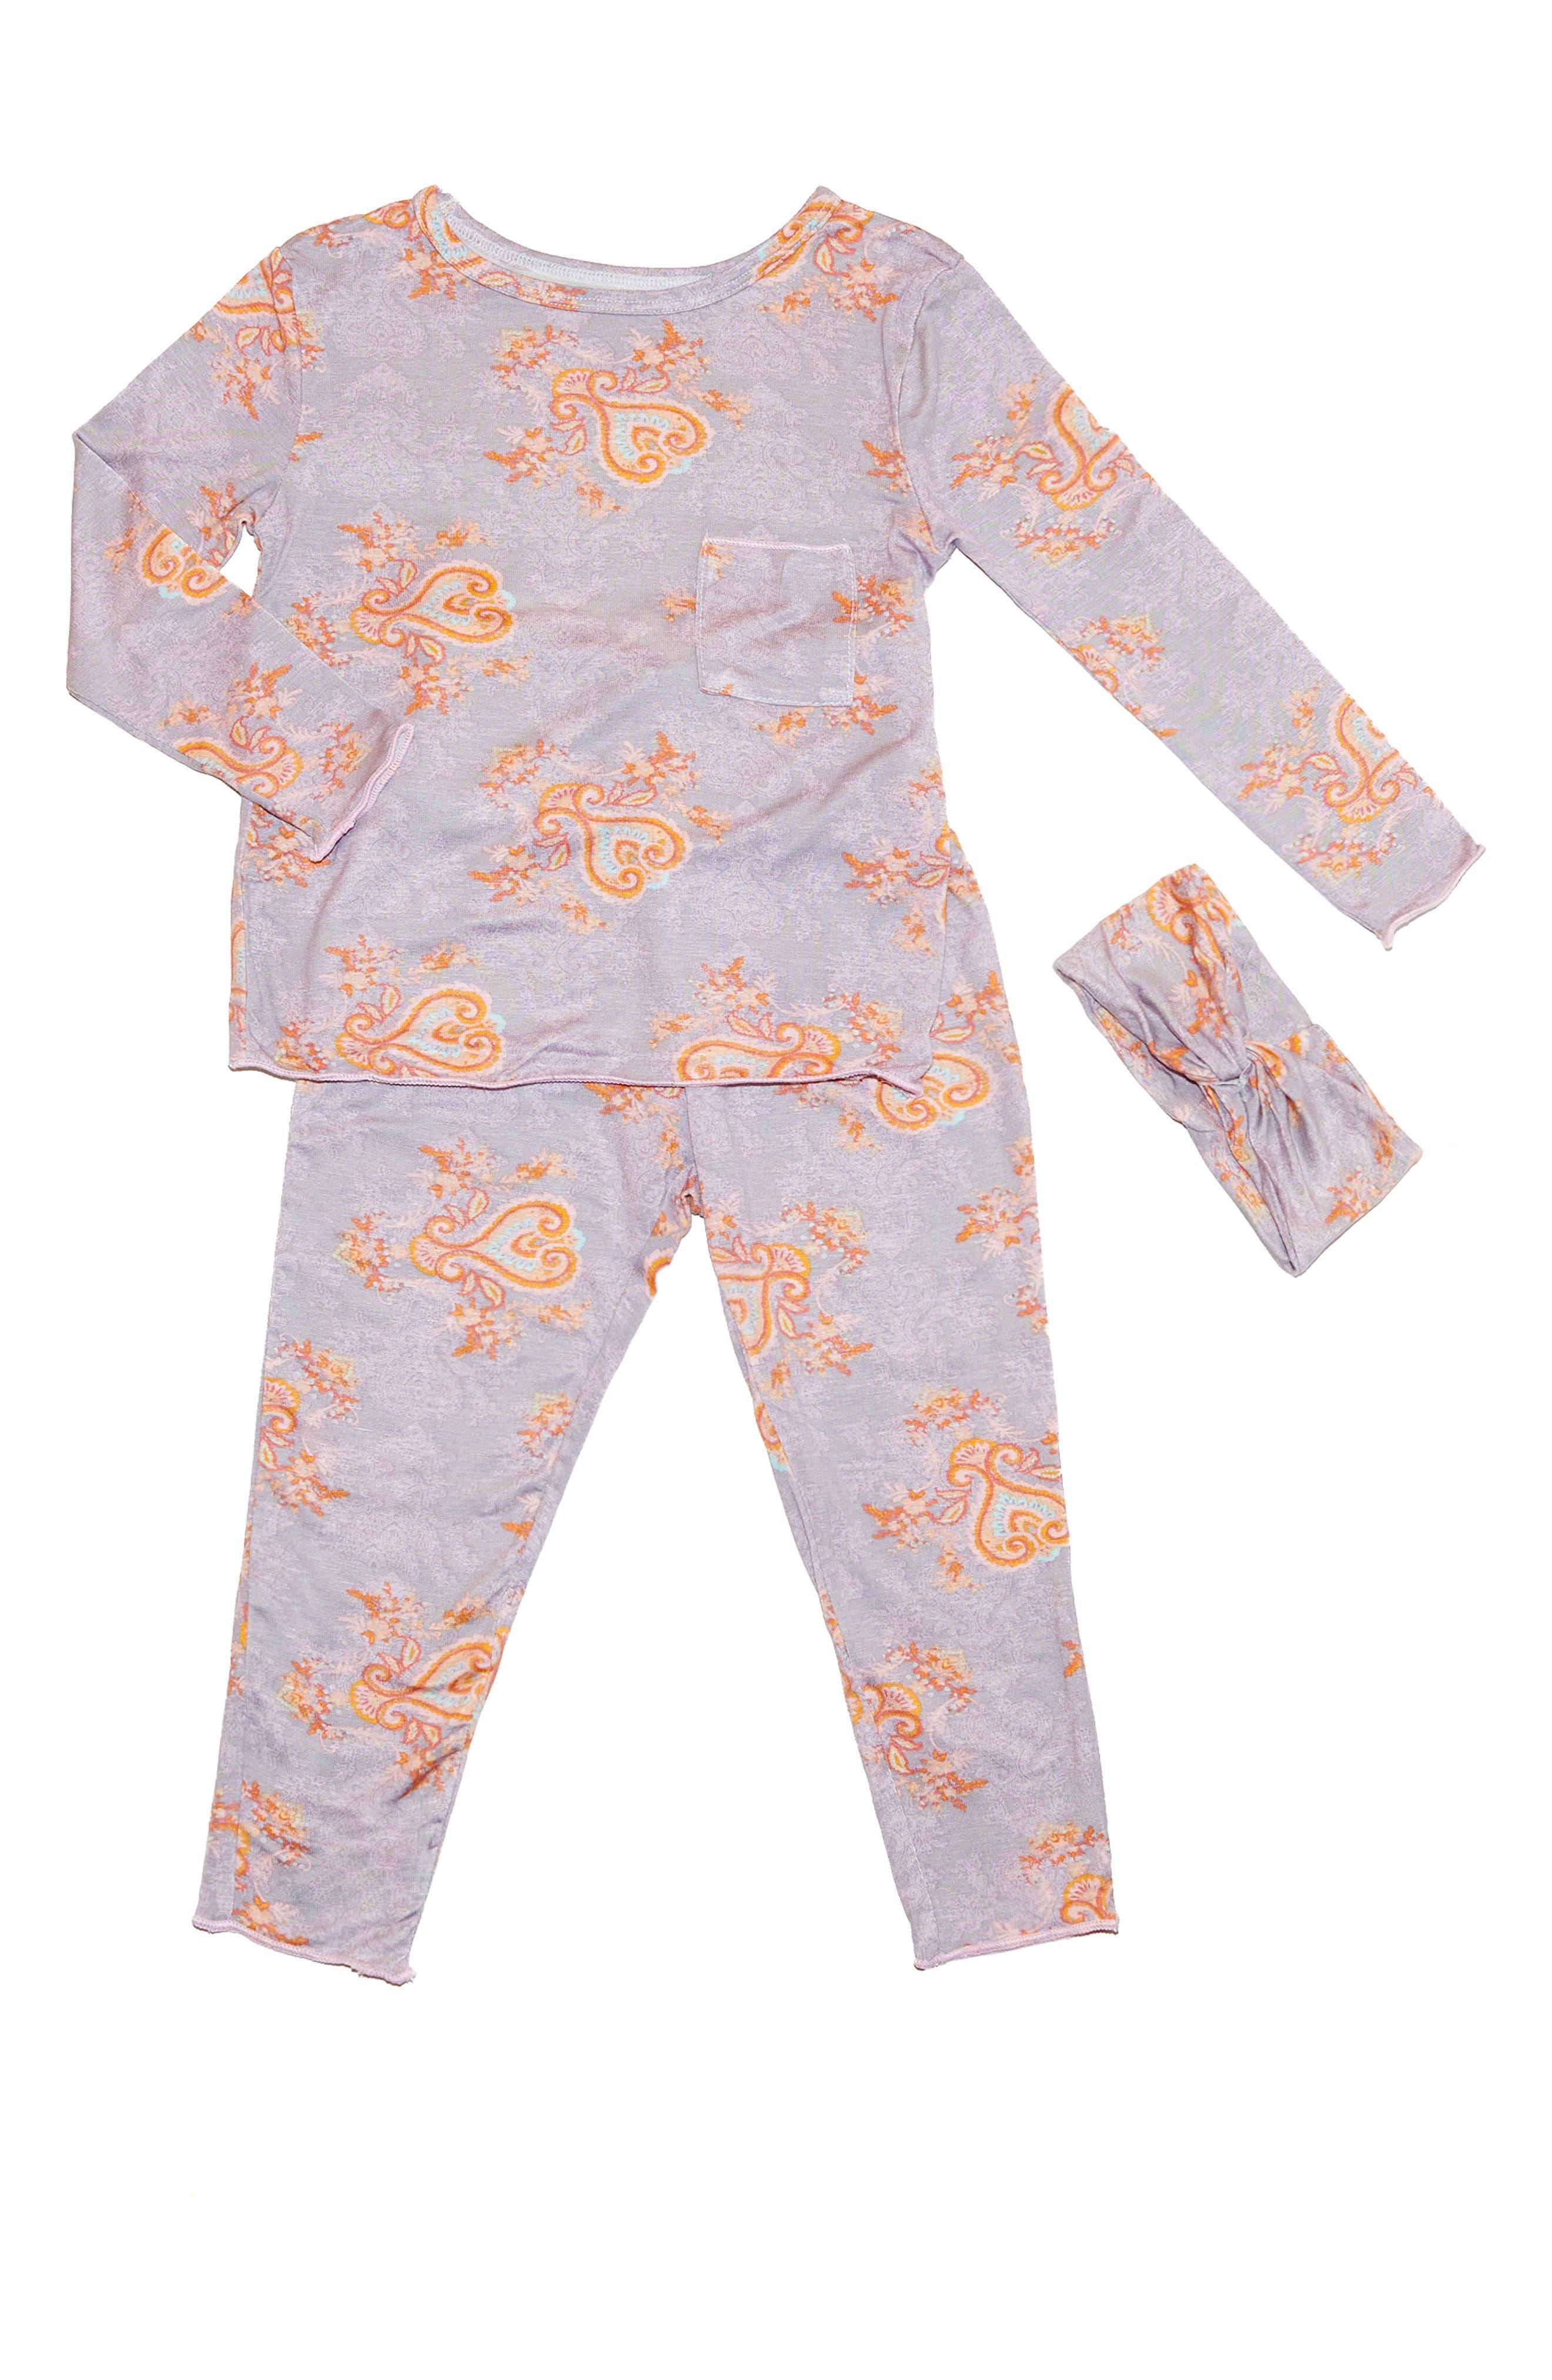 Baby Grey Charlie Fitted Two-Piece Pajamas \u0026 Head Wrap Set (Baby) Girl Sleepwear | Nordstrom